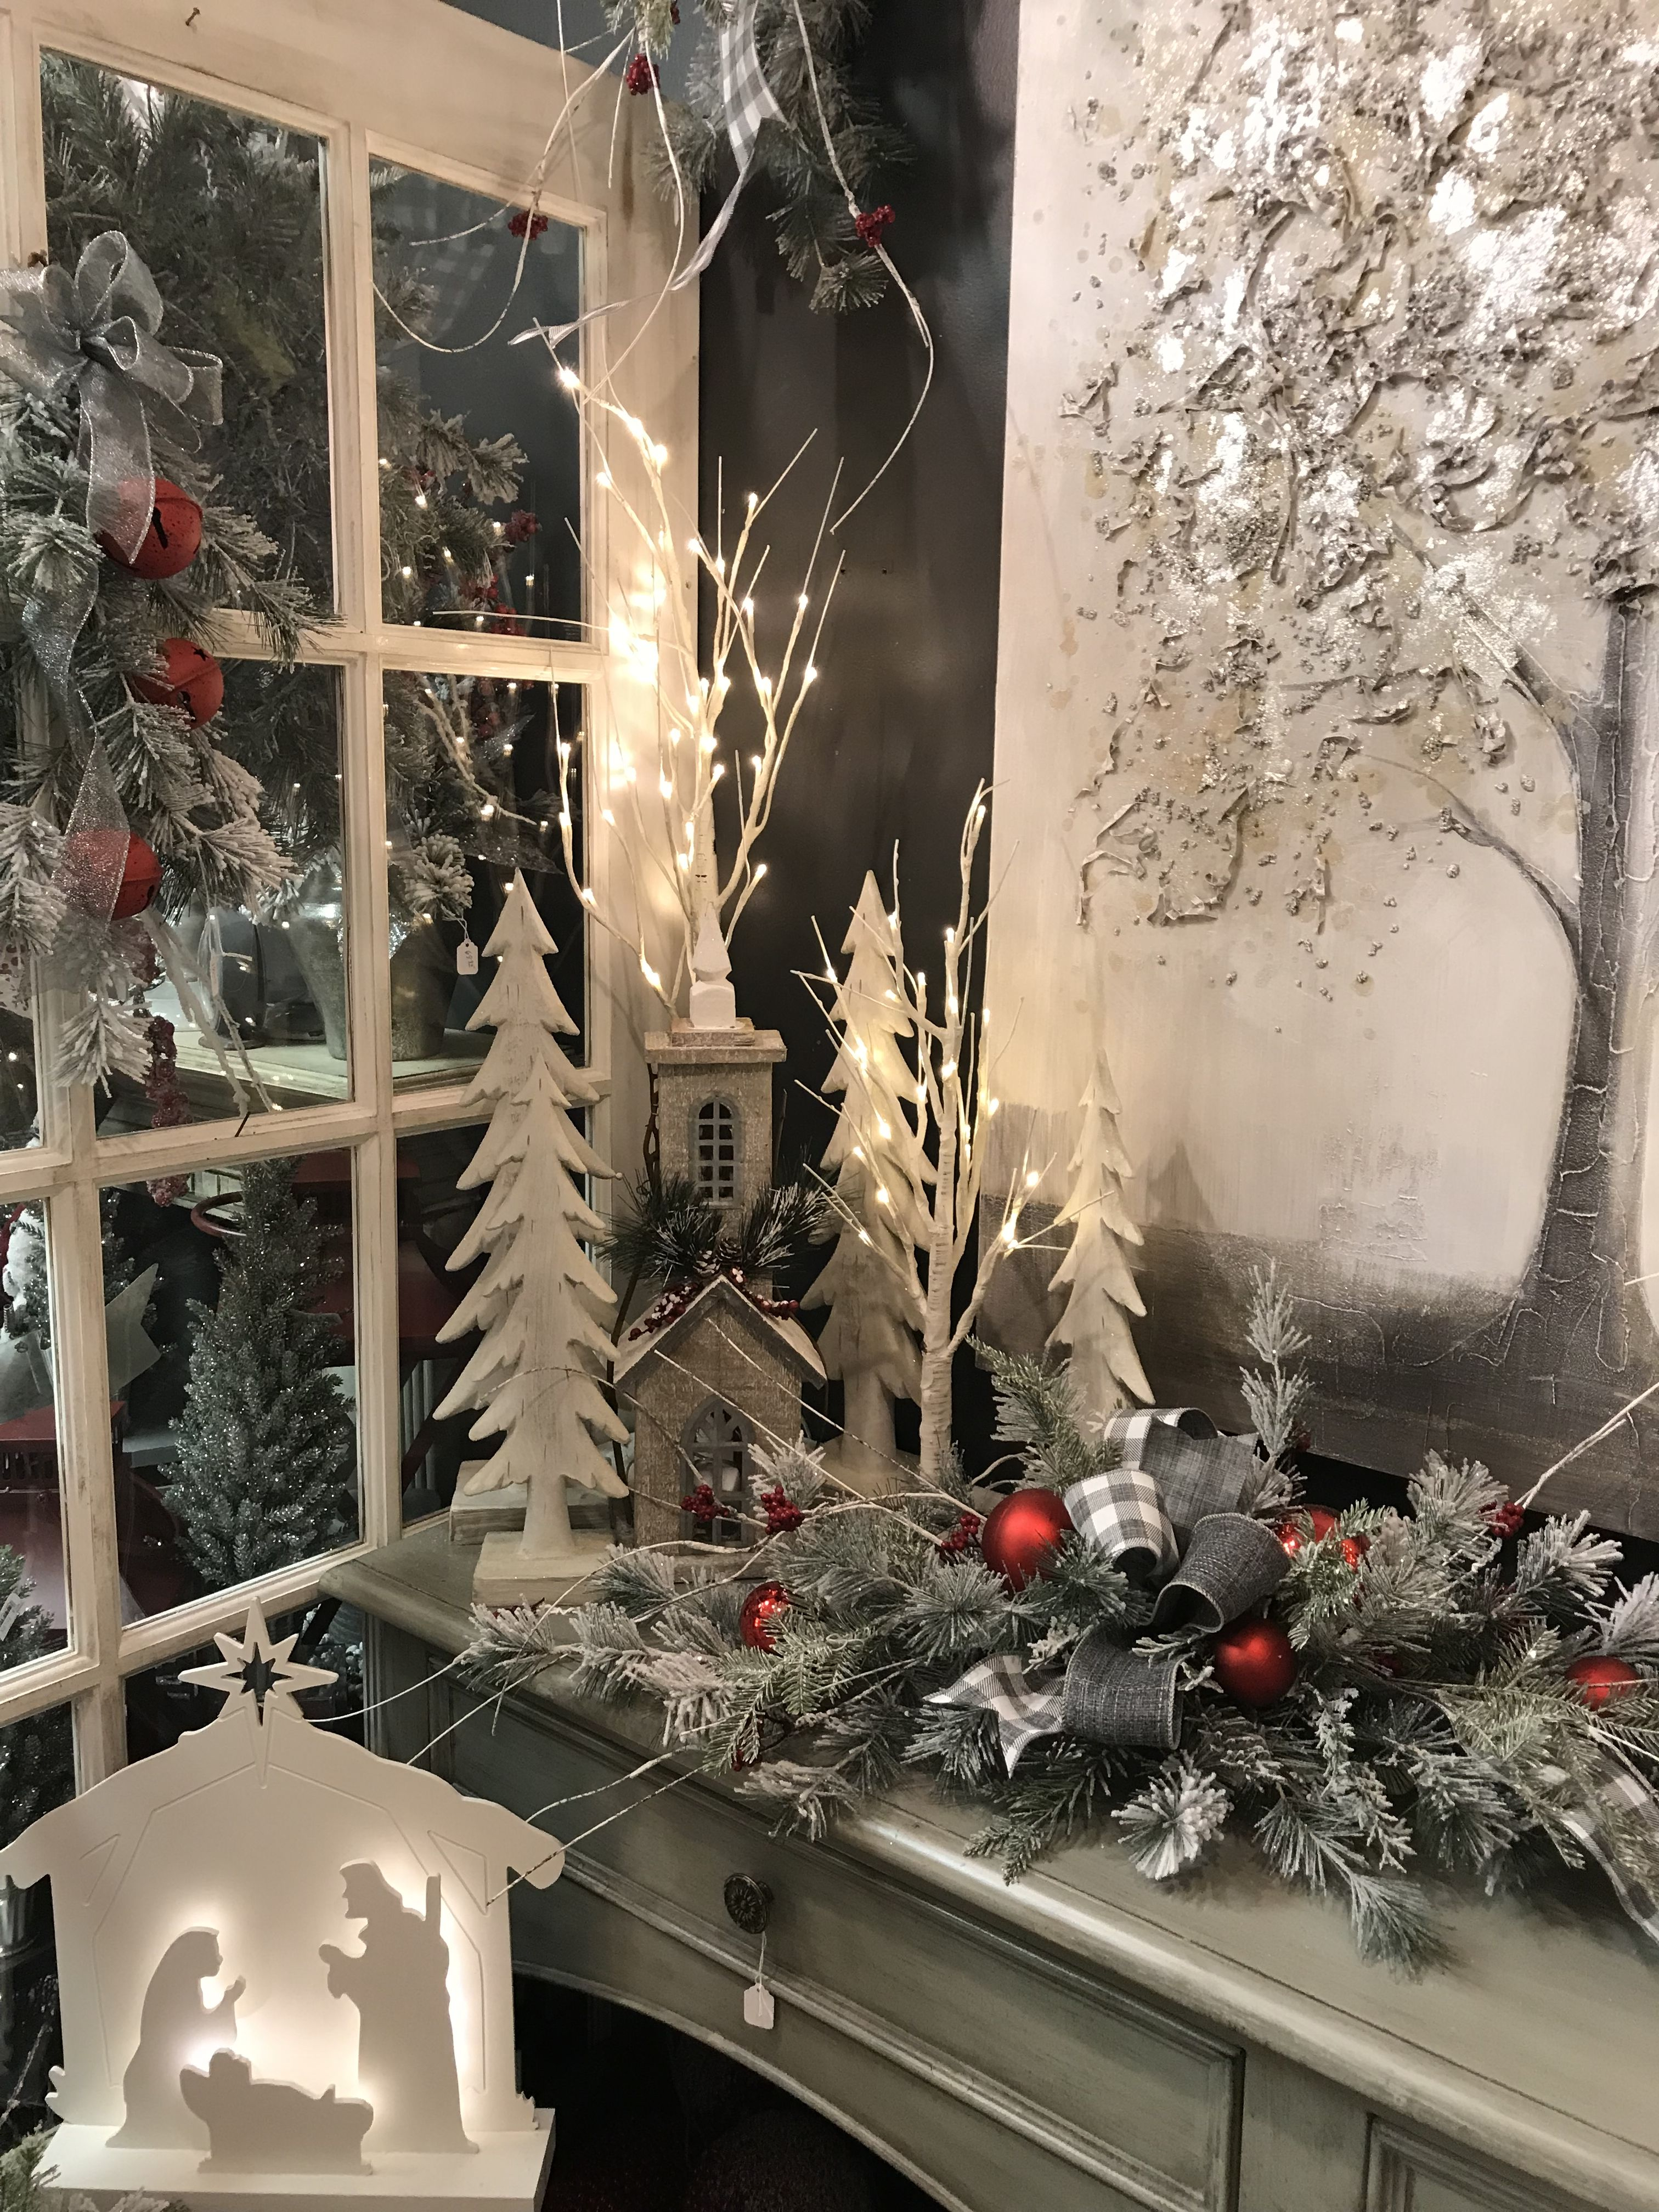 Epingle Par Marco Levesque Sur Noel Idee Deco Noel Deco Noel Noel